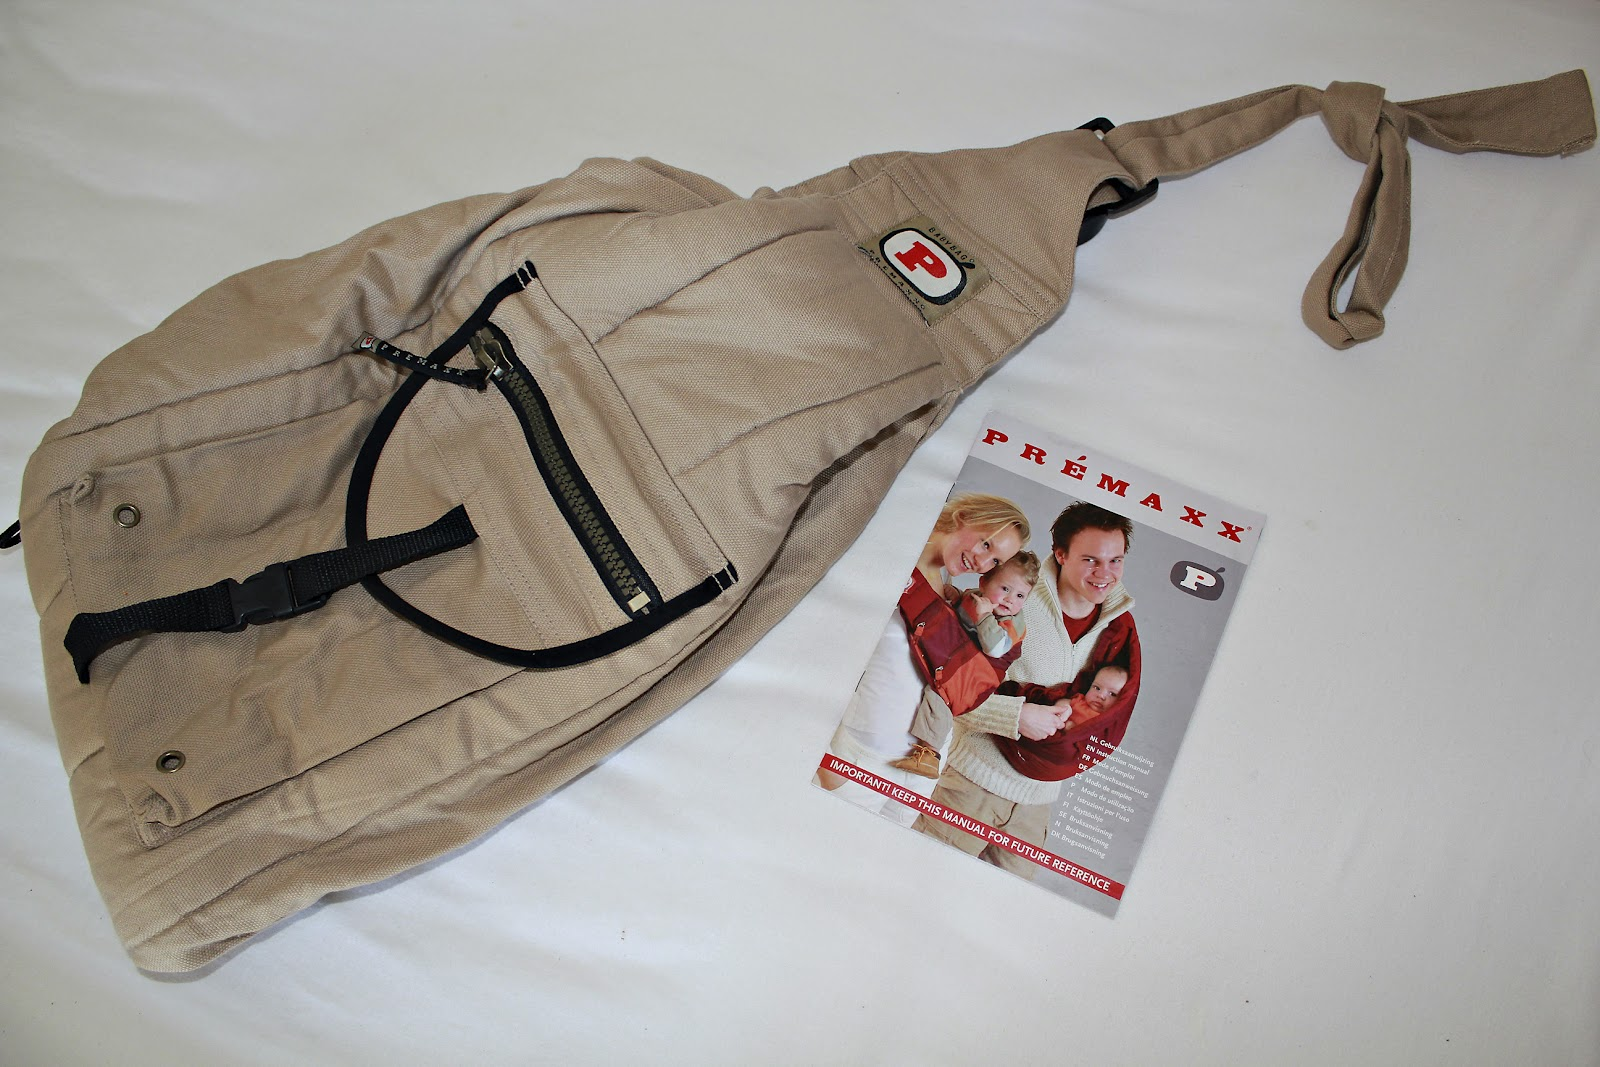 dce078c32eb Porte-bébé baby-bag Premaxx